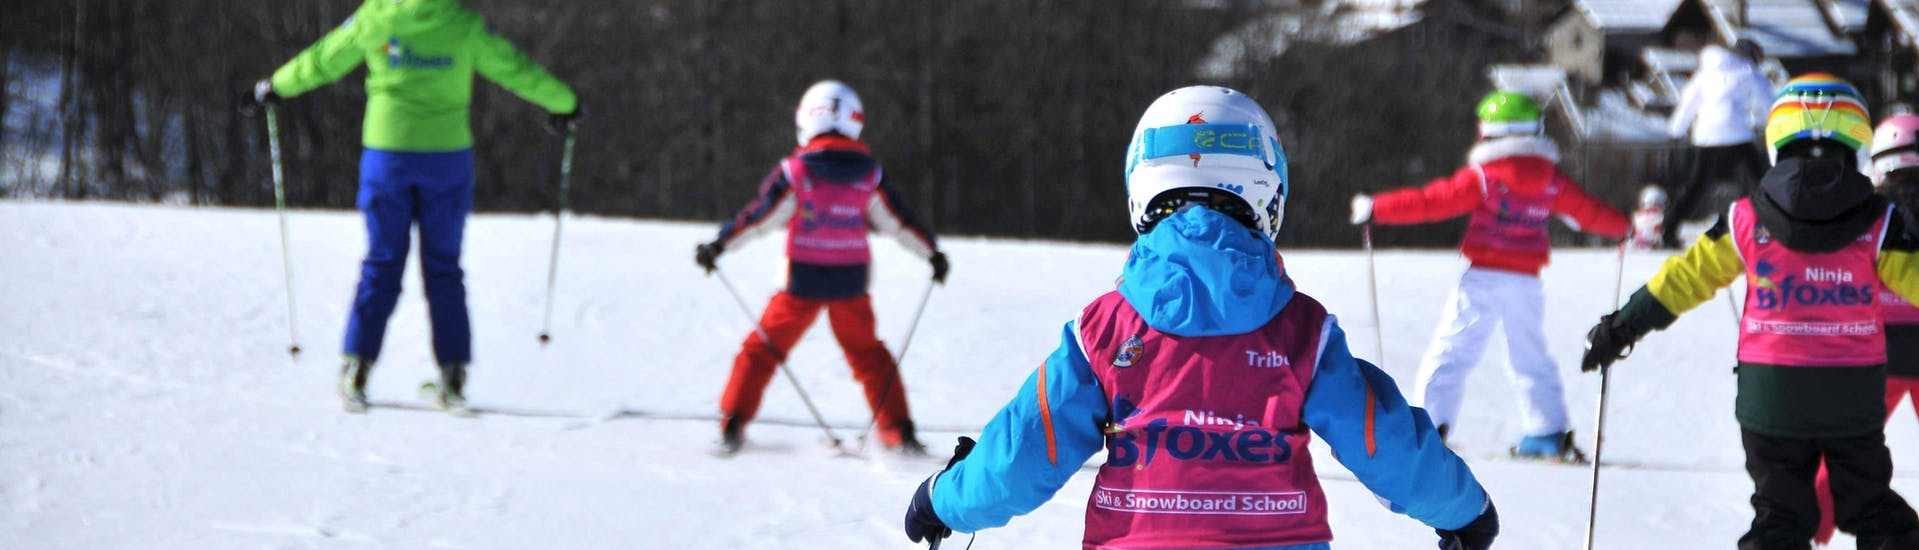 Children learn how to ski in Kids Ski Lessons (7-12 y.) - Advanced - Christmas in the ski school Scuola di Sci B.foxes.